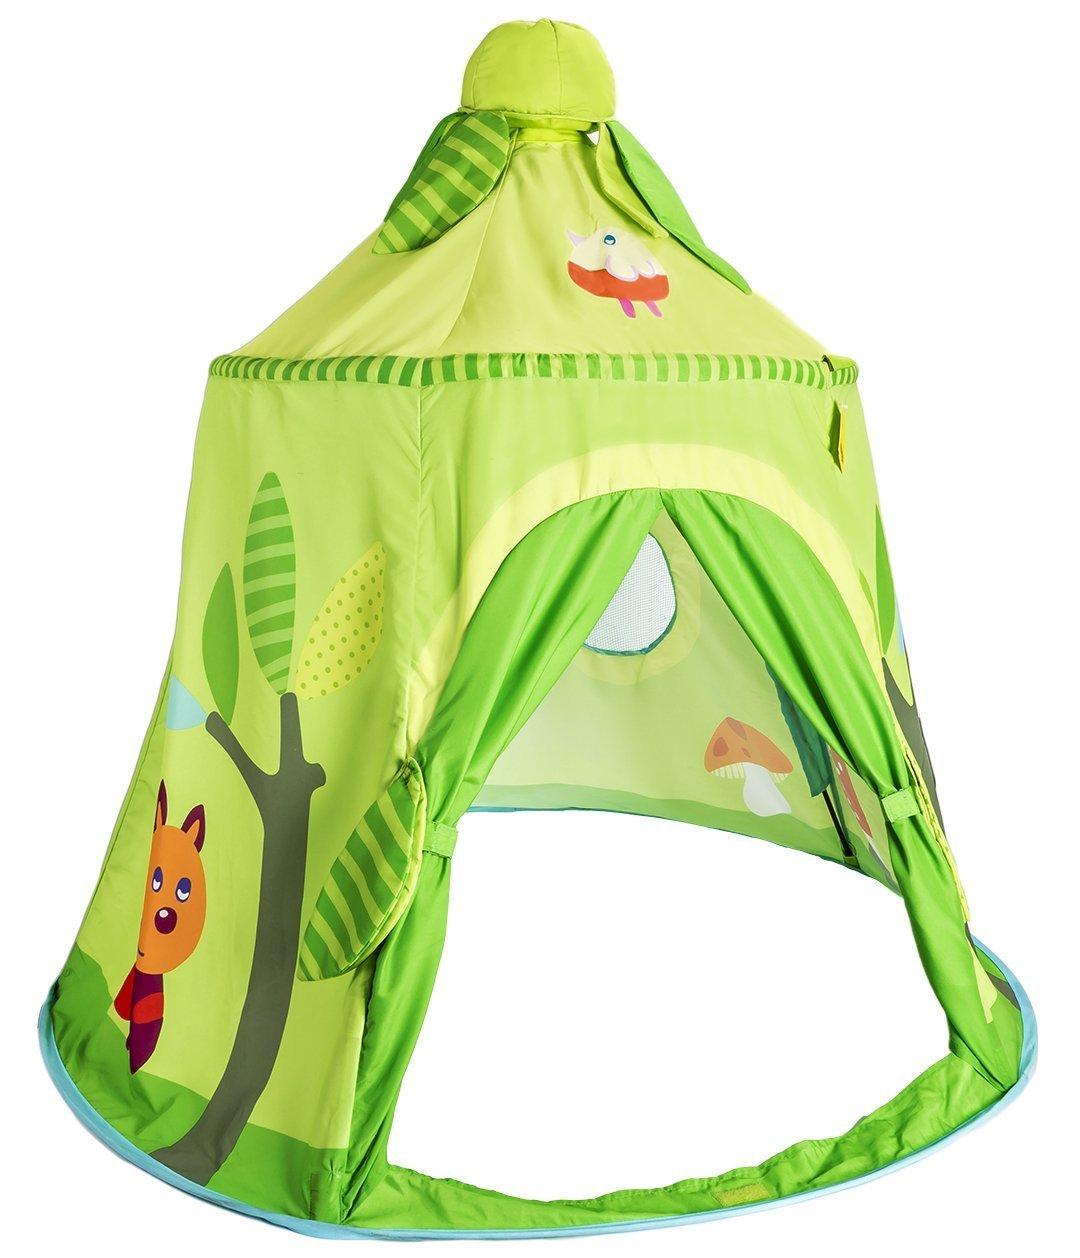 Haba Magic Wood Play Tent [並行輸入品] B074THB5CM